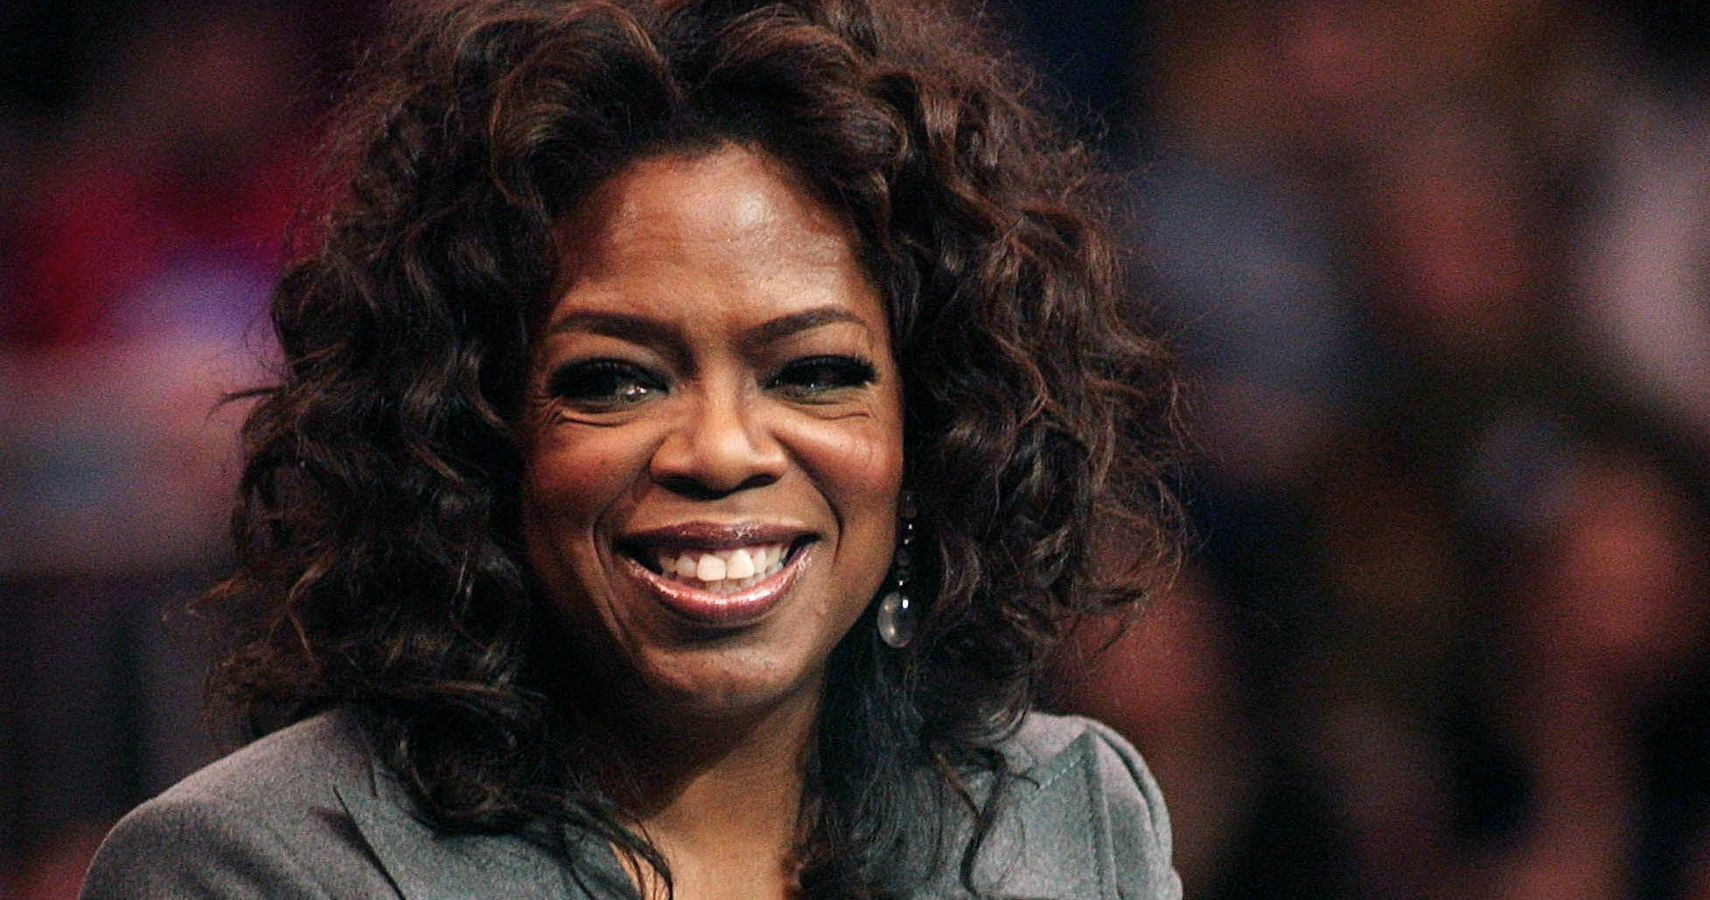 The Oprah Winfrey Way: 7 Successful Business Ventures That Made Oprah A Billiona